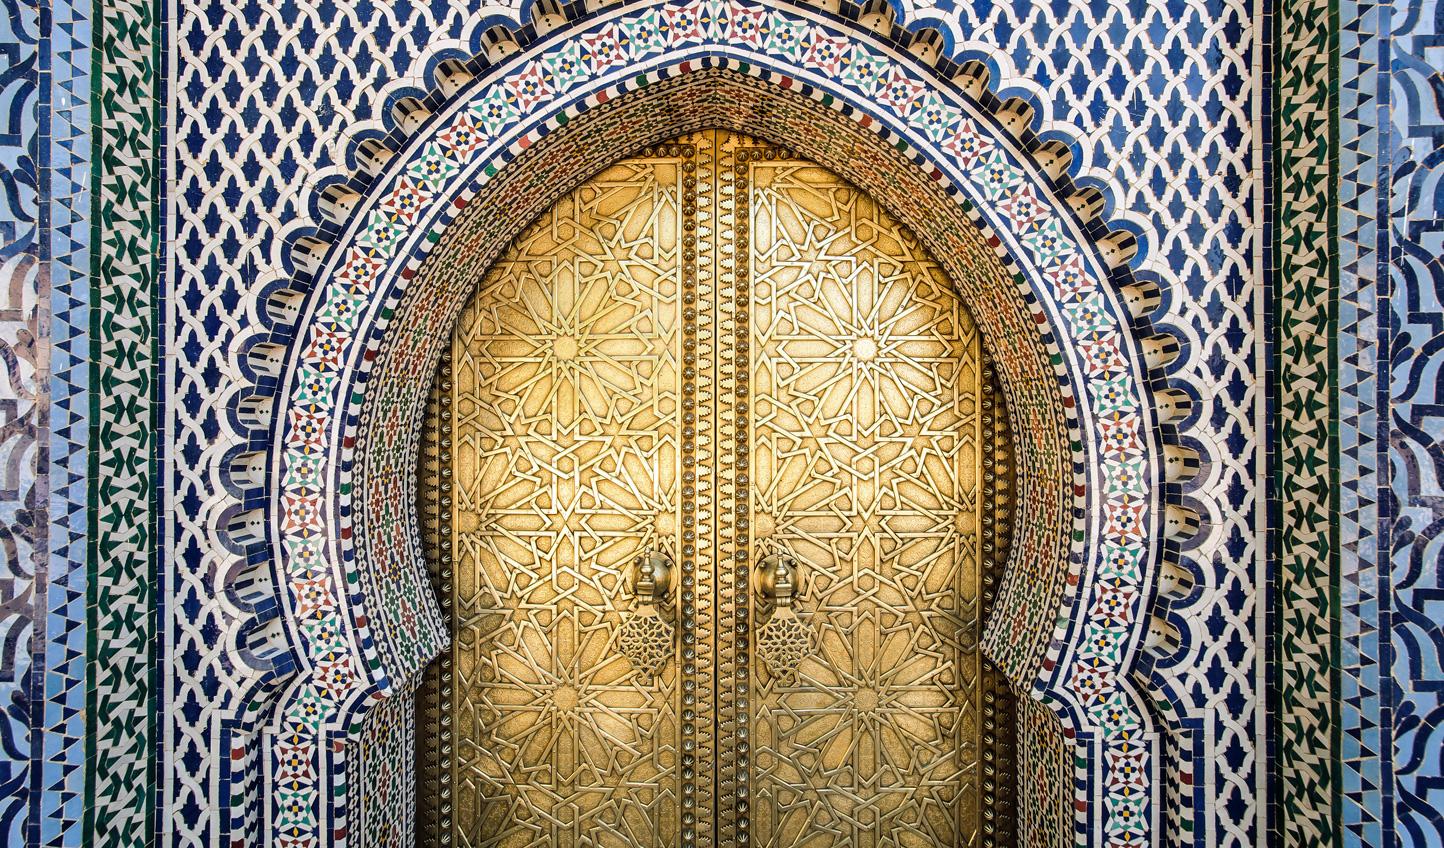 Explore the ancient capital of Fez